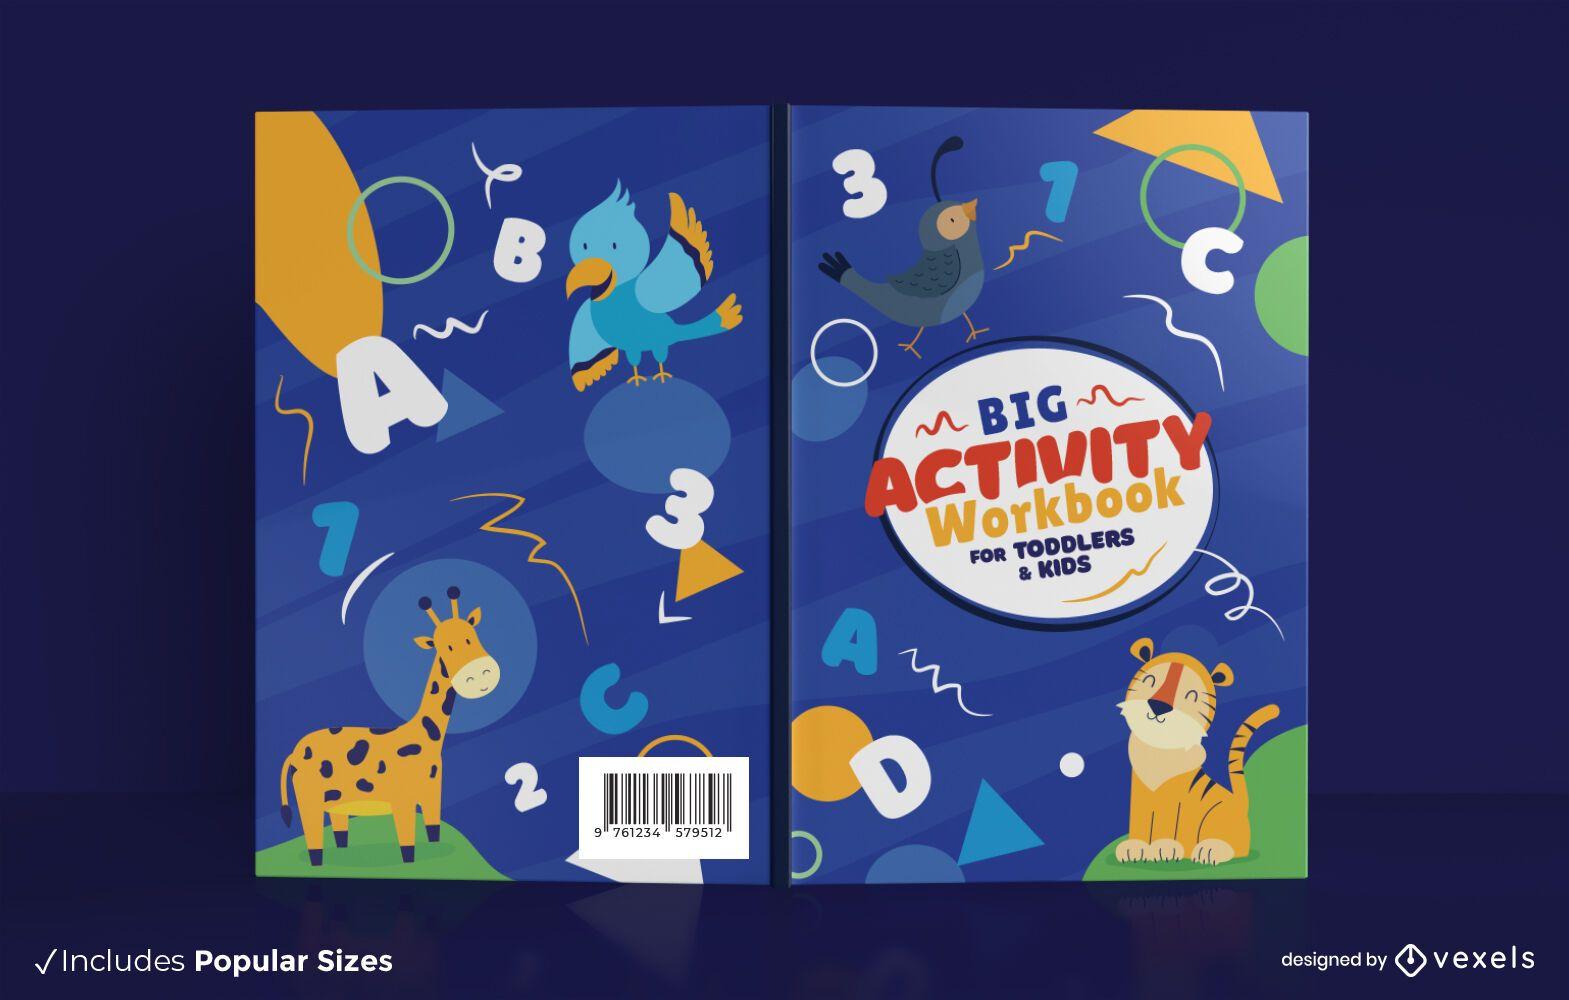 Kids activity workbook cover design